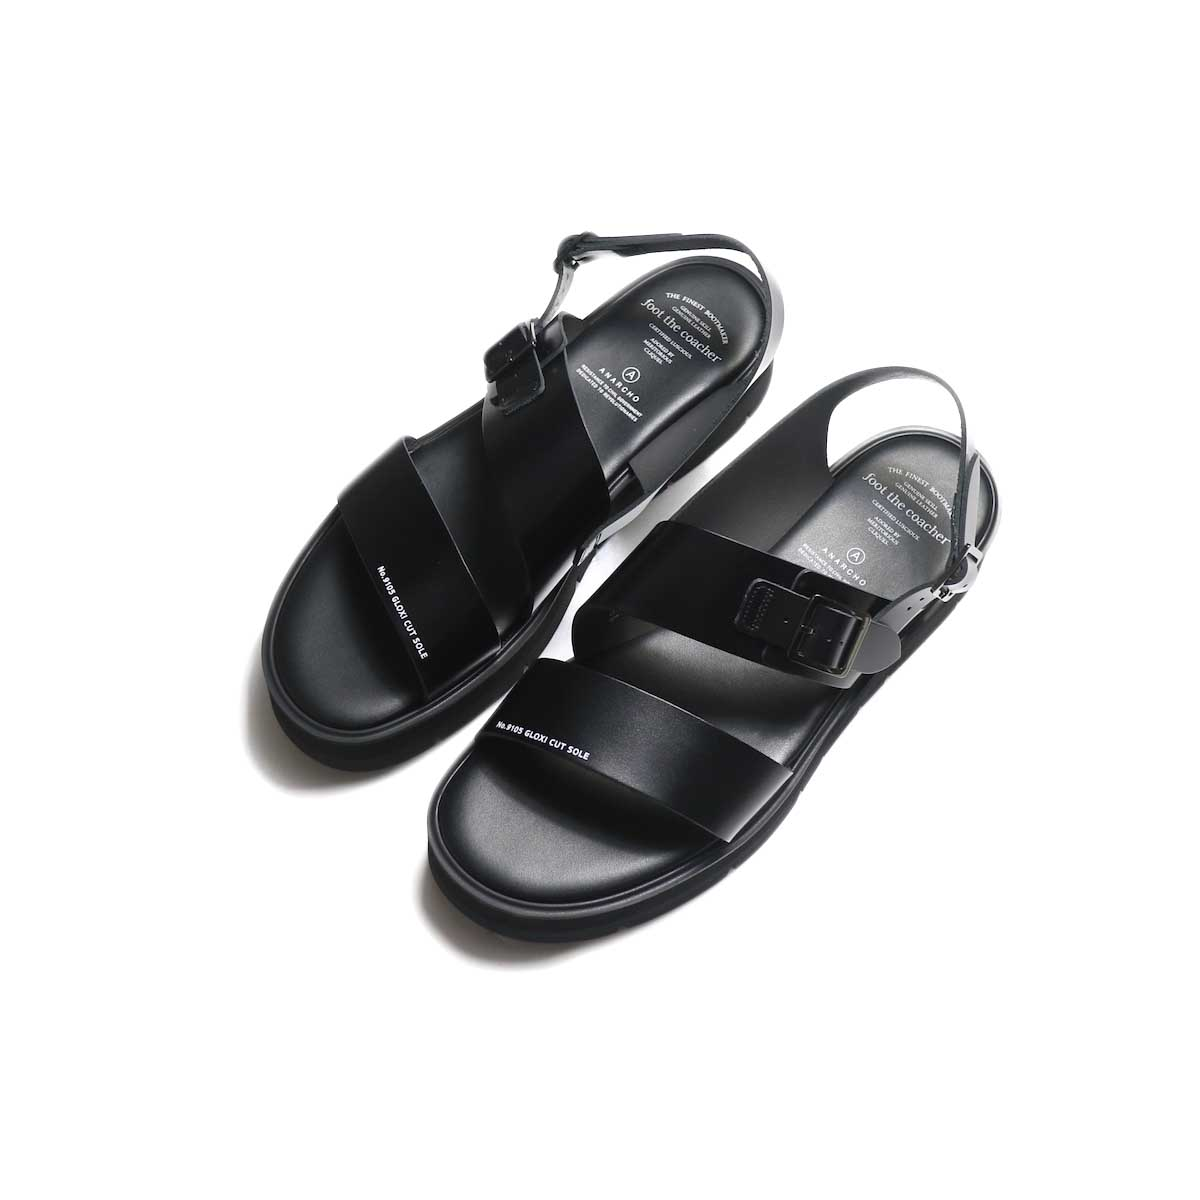 foot the coacher / SS BELT SANDALS (GLOXI CUT SOLE) -Black ナナメ